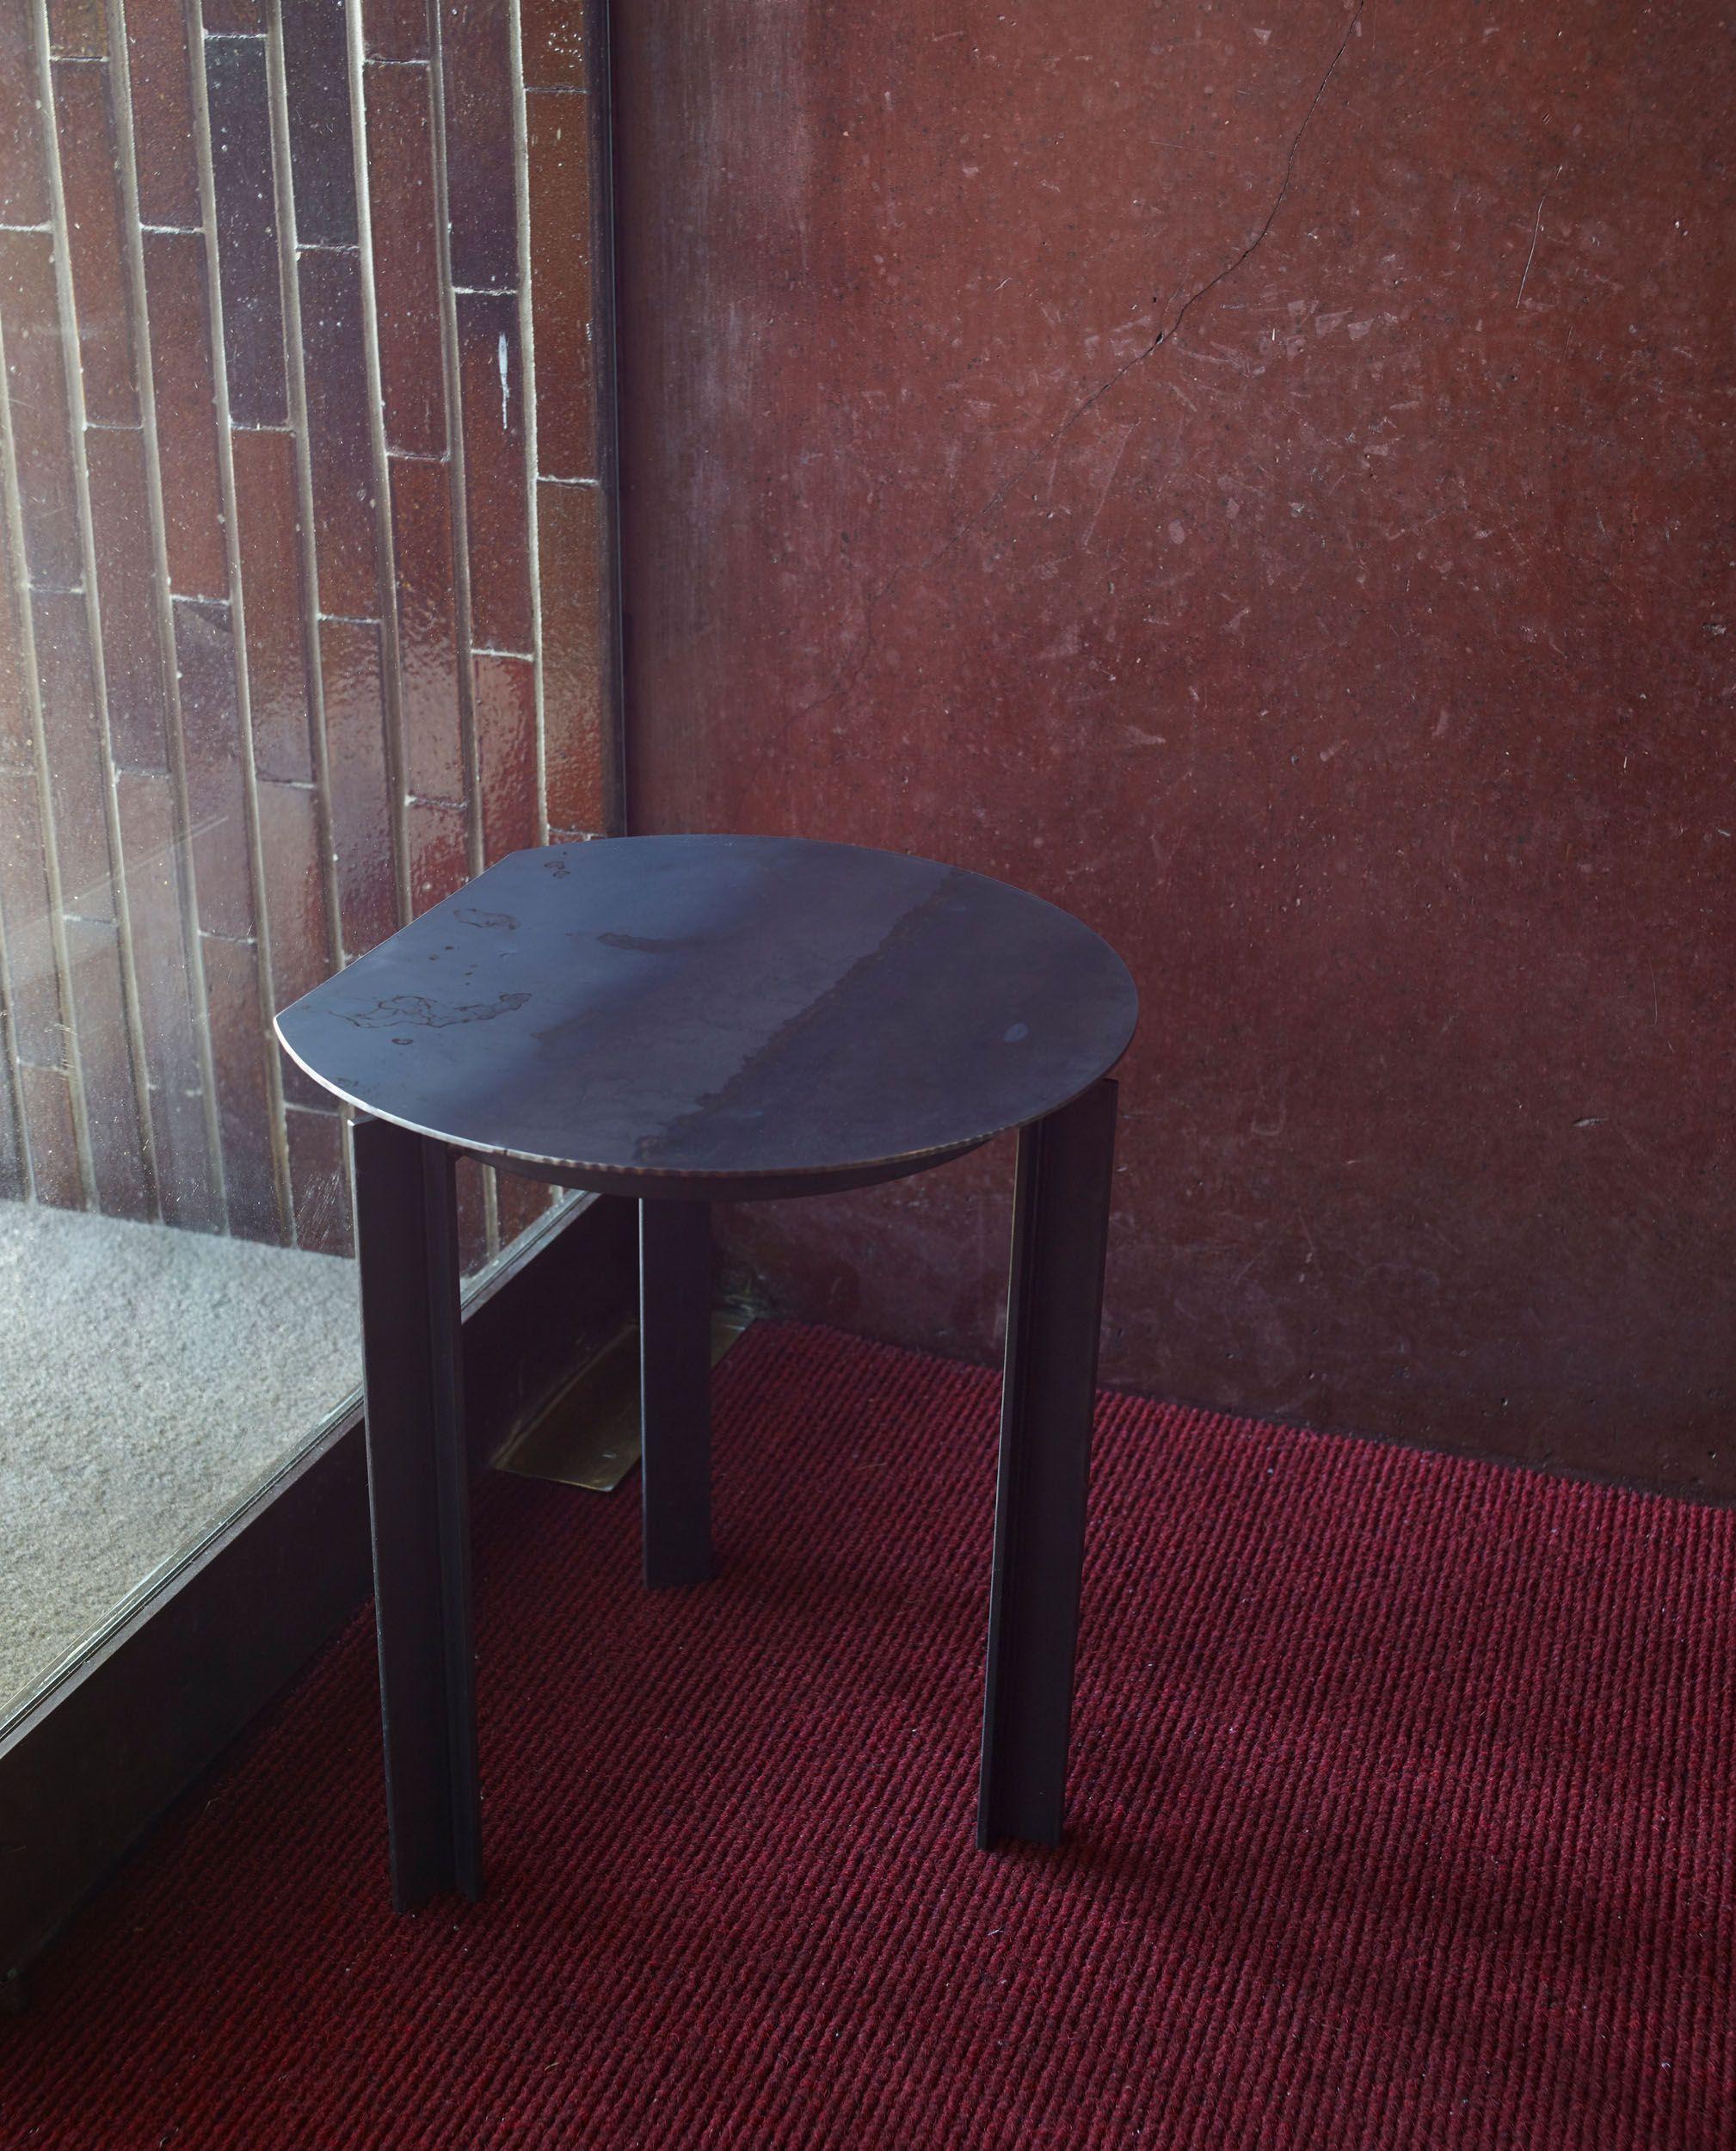 Sillabe Luca Baroni Furniture Table 13